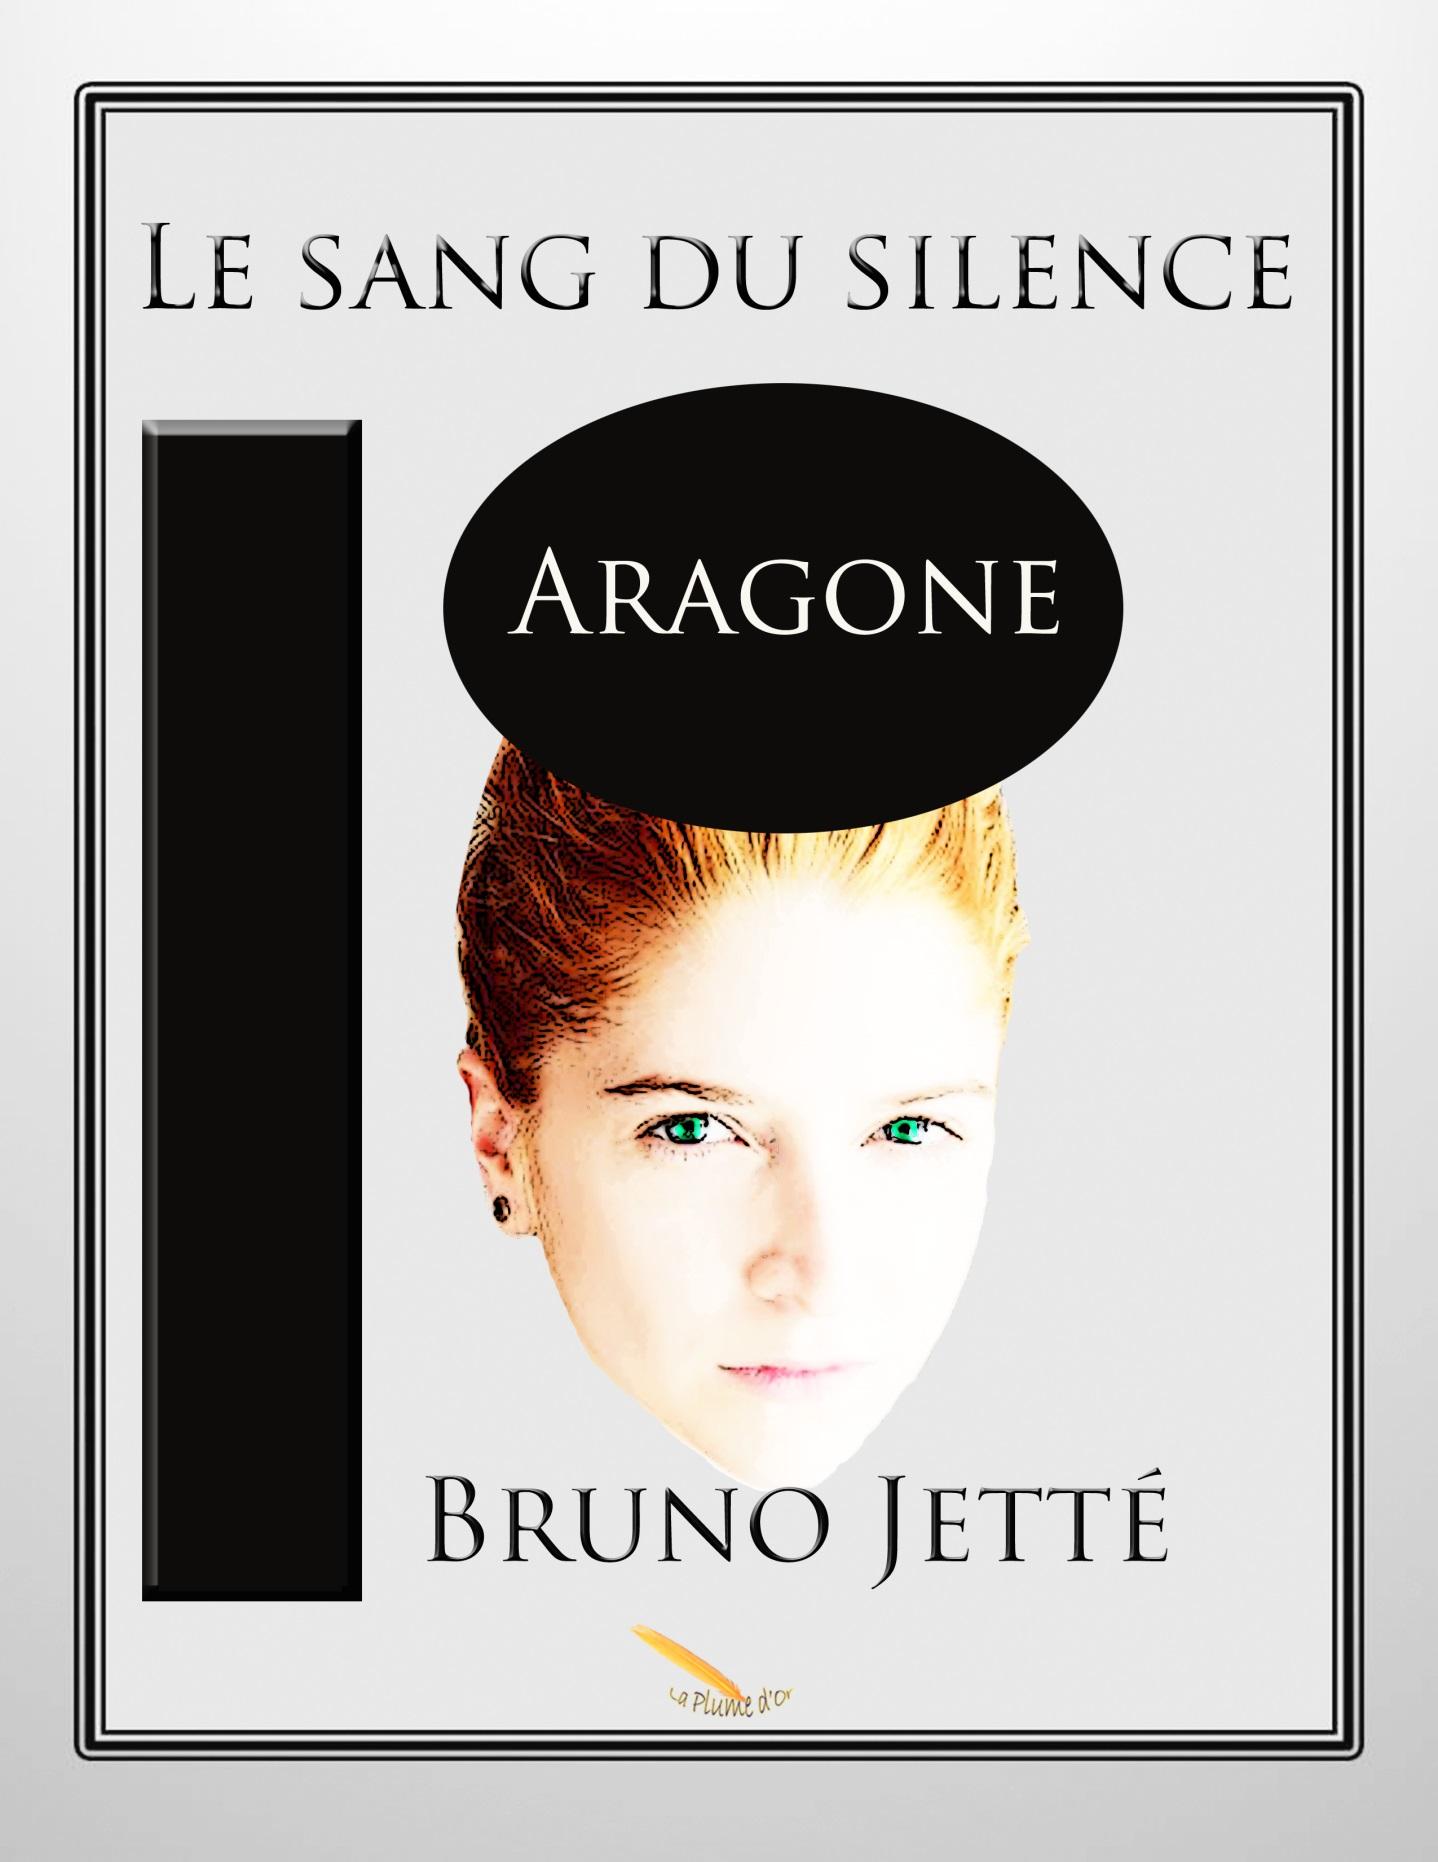 Le sang du silence 2: Aragone